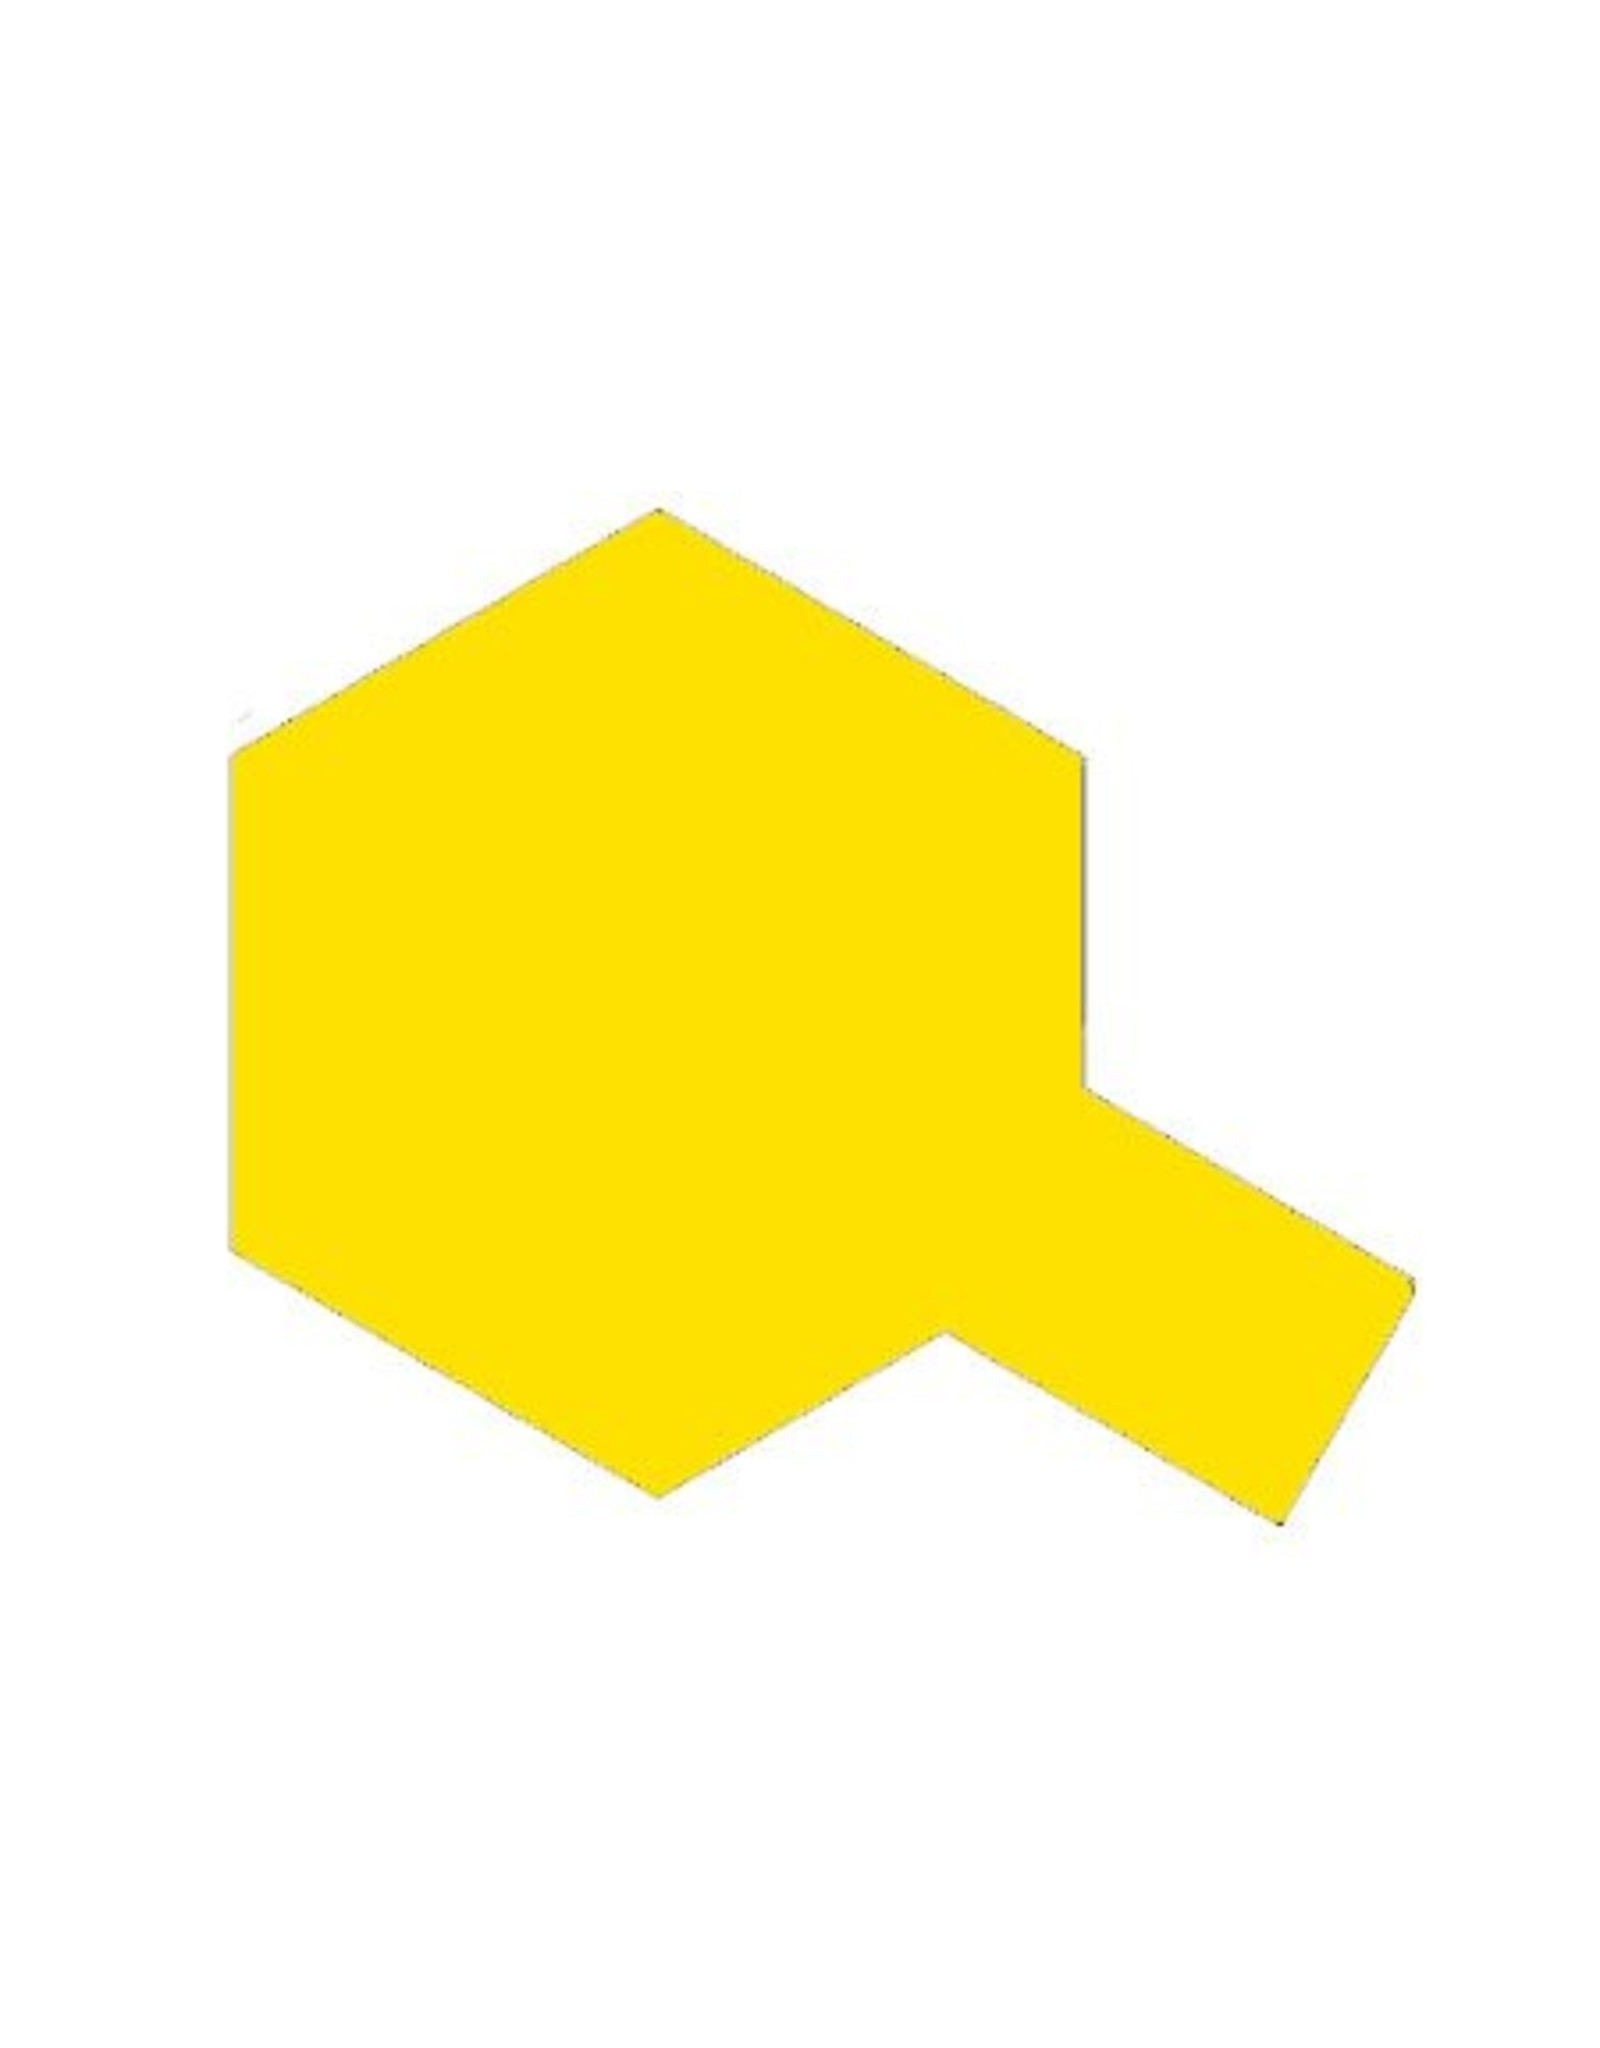 Tamiya Acrylic Mini X-24 Clear Yellow